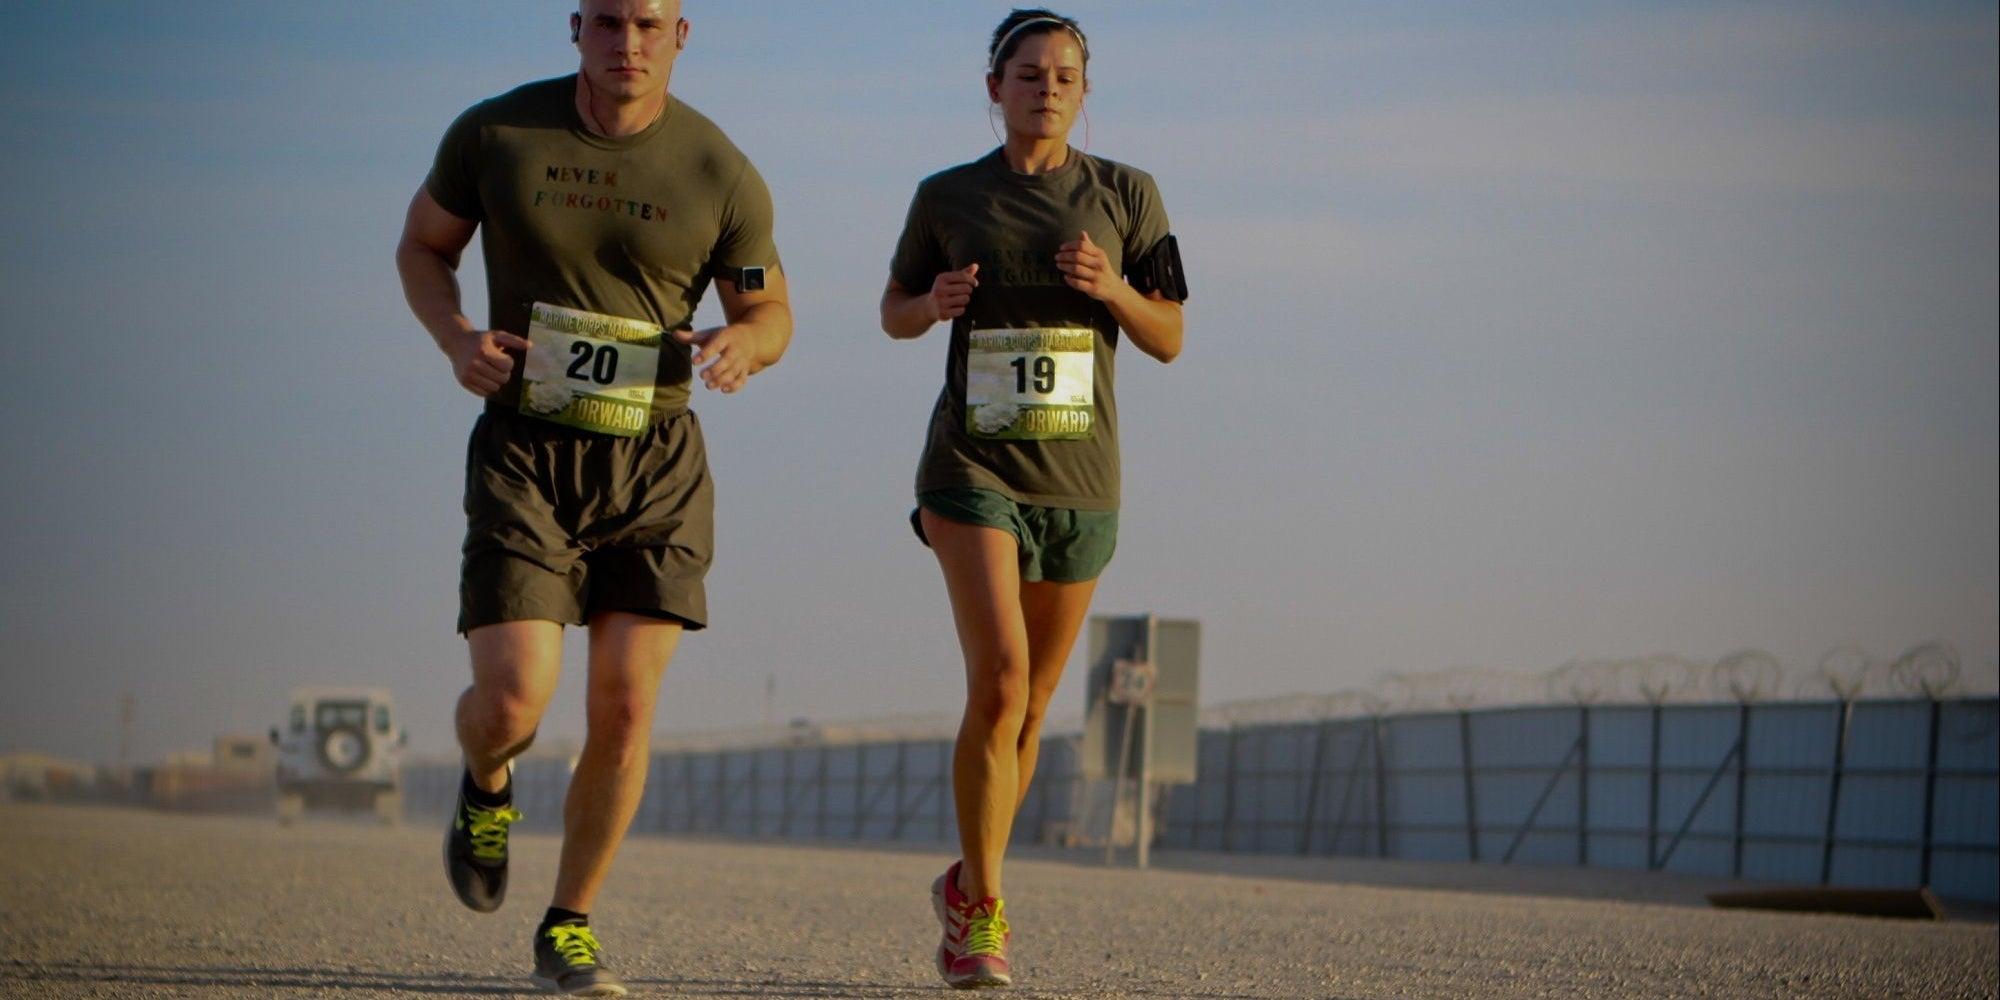 #10 Marathons to Run & Explore Life Beyond Office